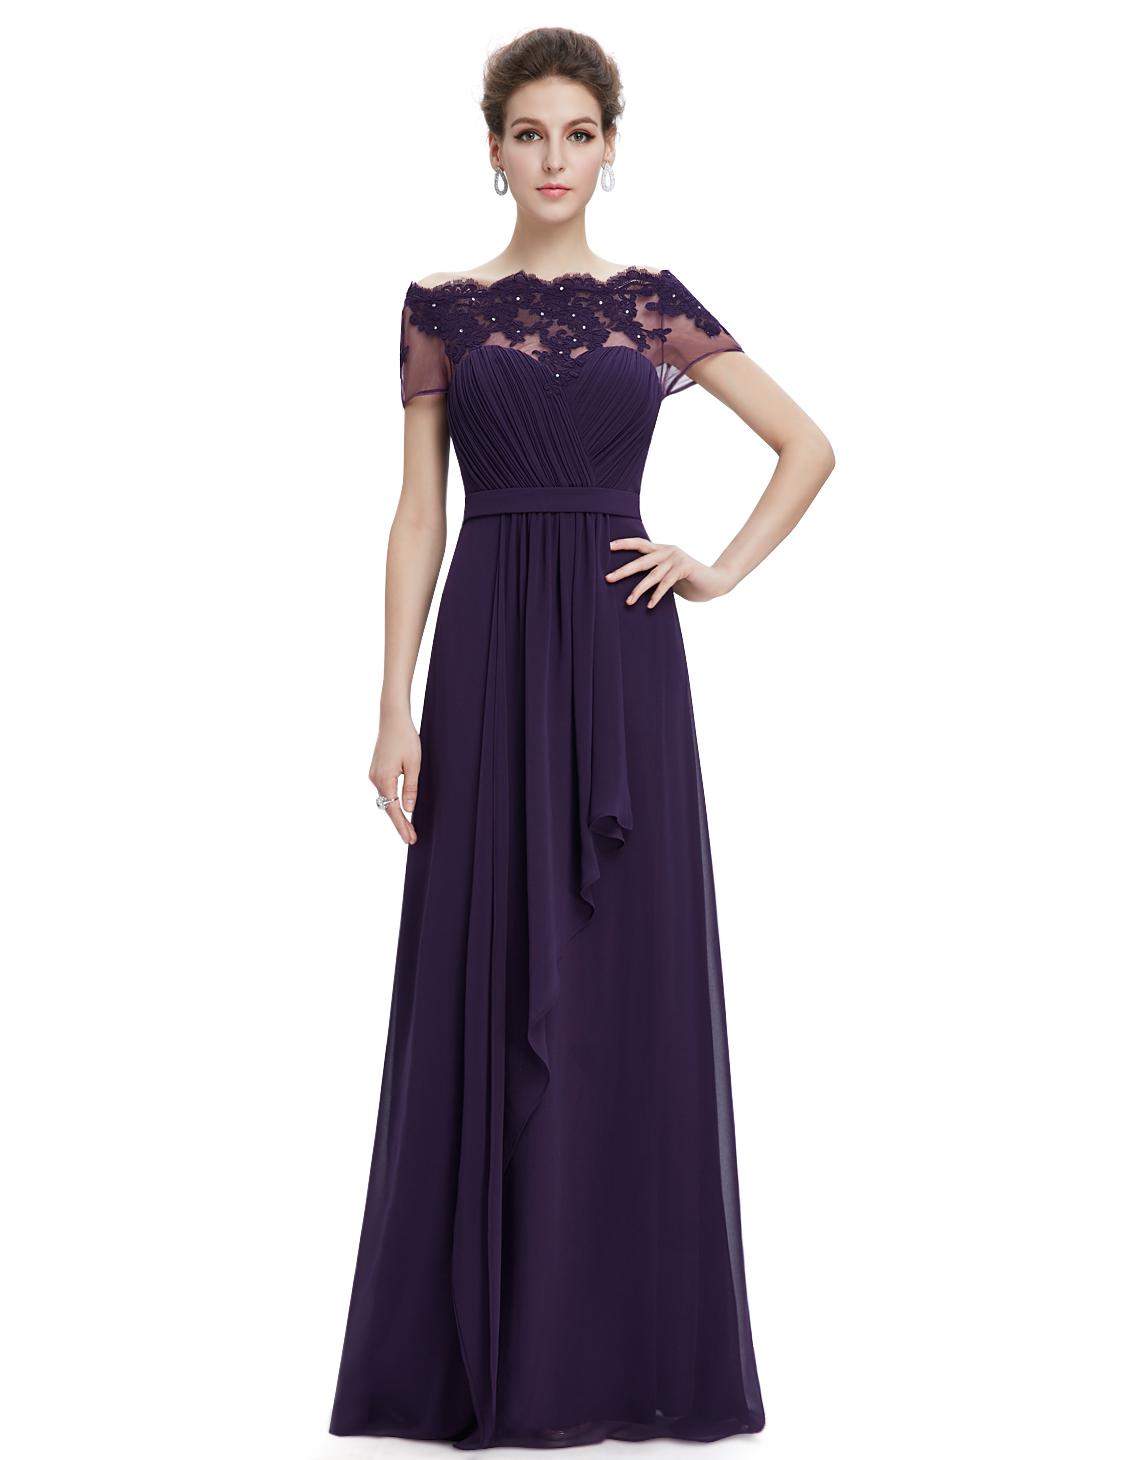 Women's Elegant Long Bridesmaid Dresses Formal Evening ...